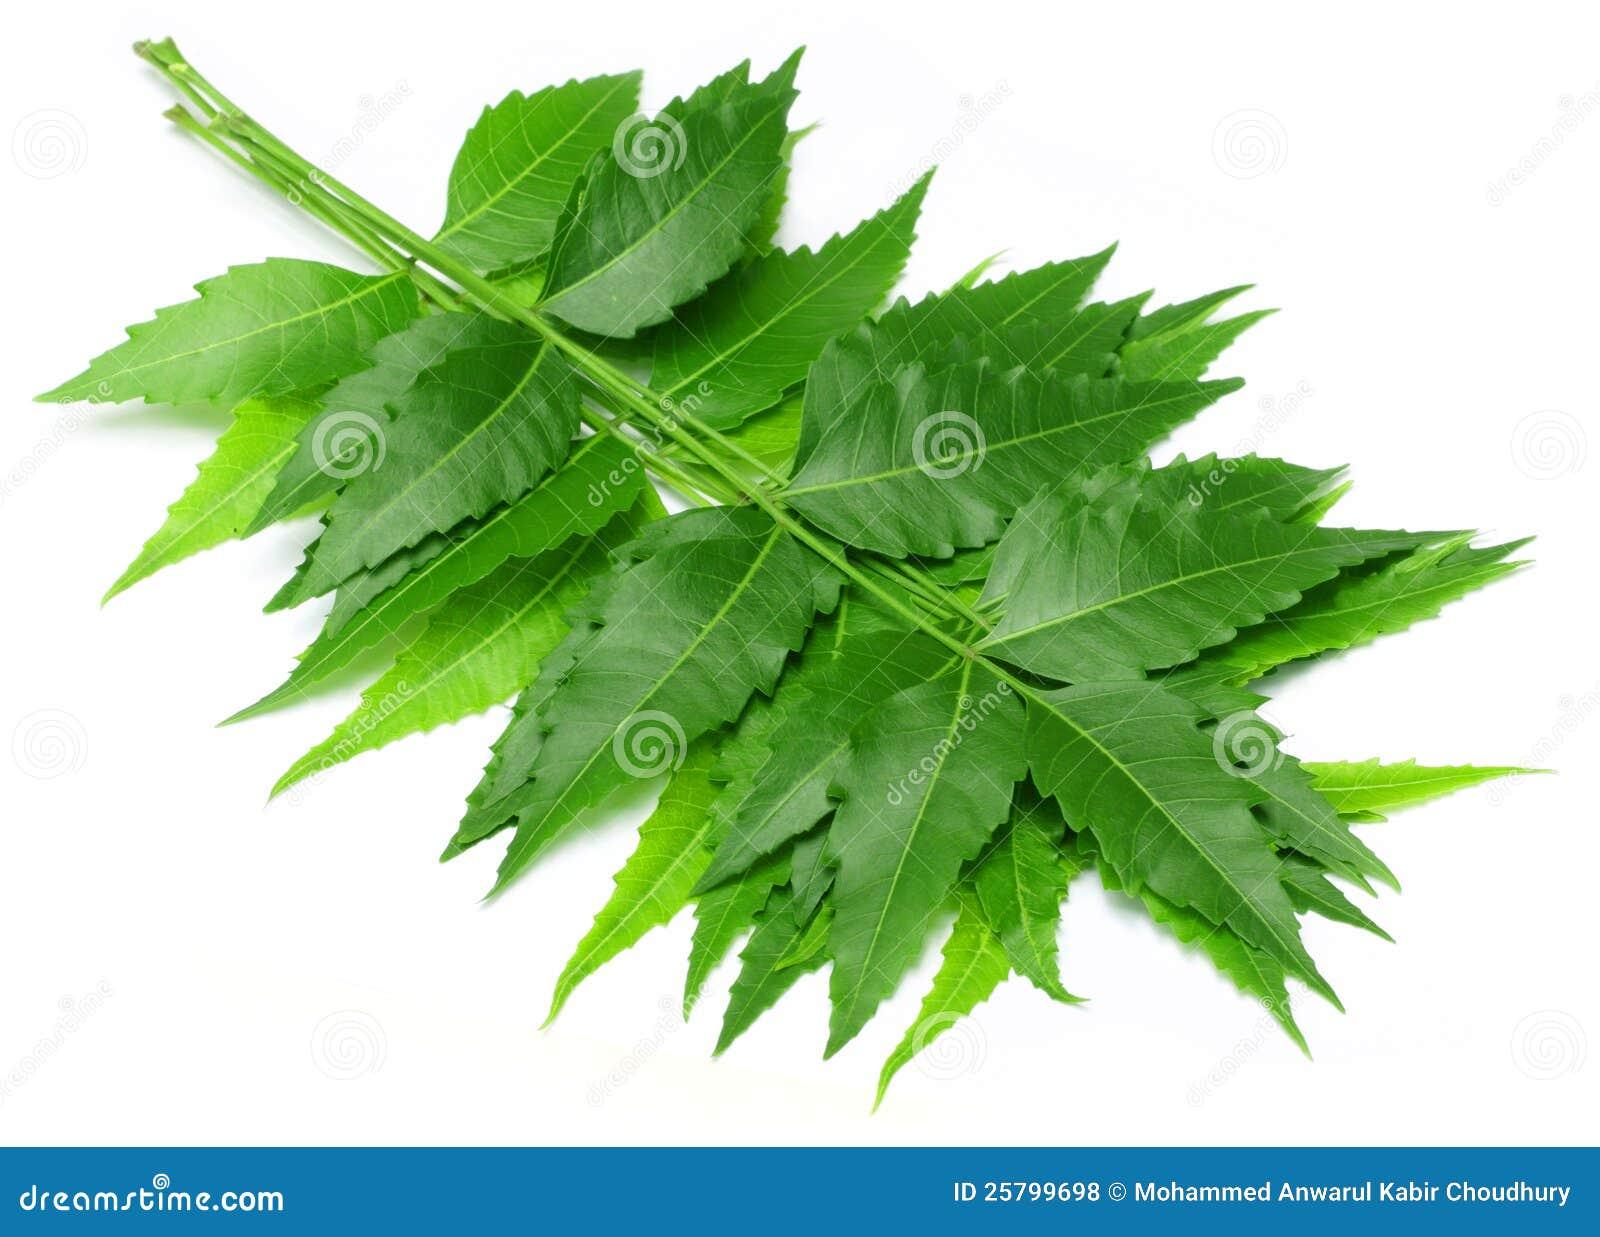 Tender Medicinal Neem Leaves Stock Photo - Image of margosa